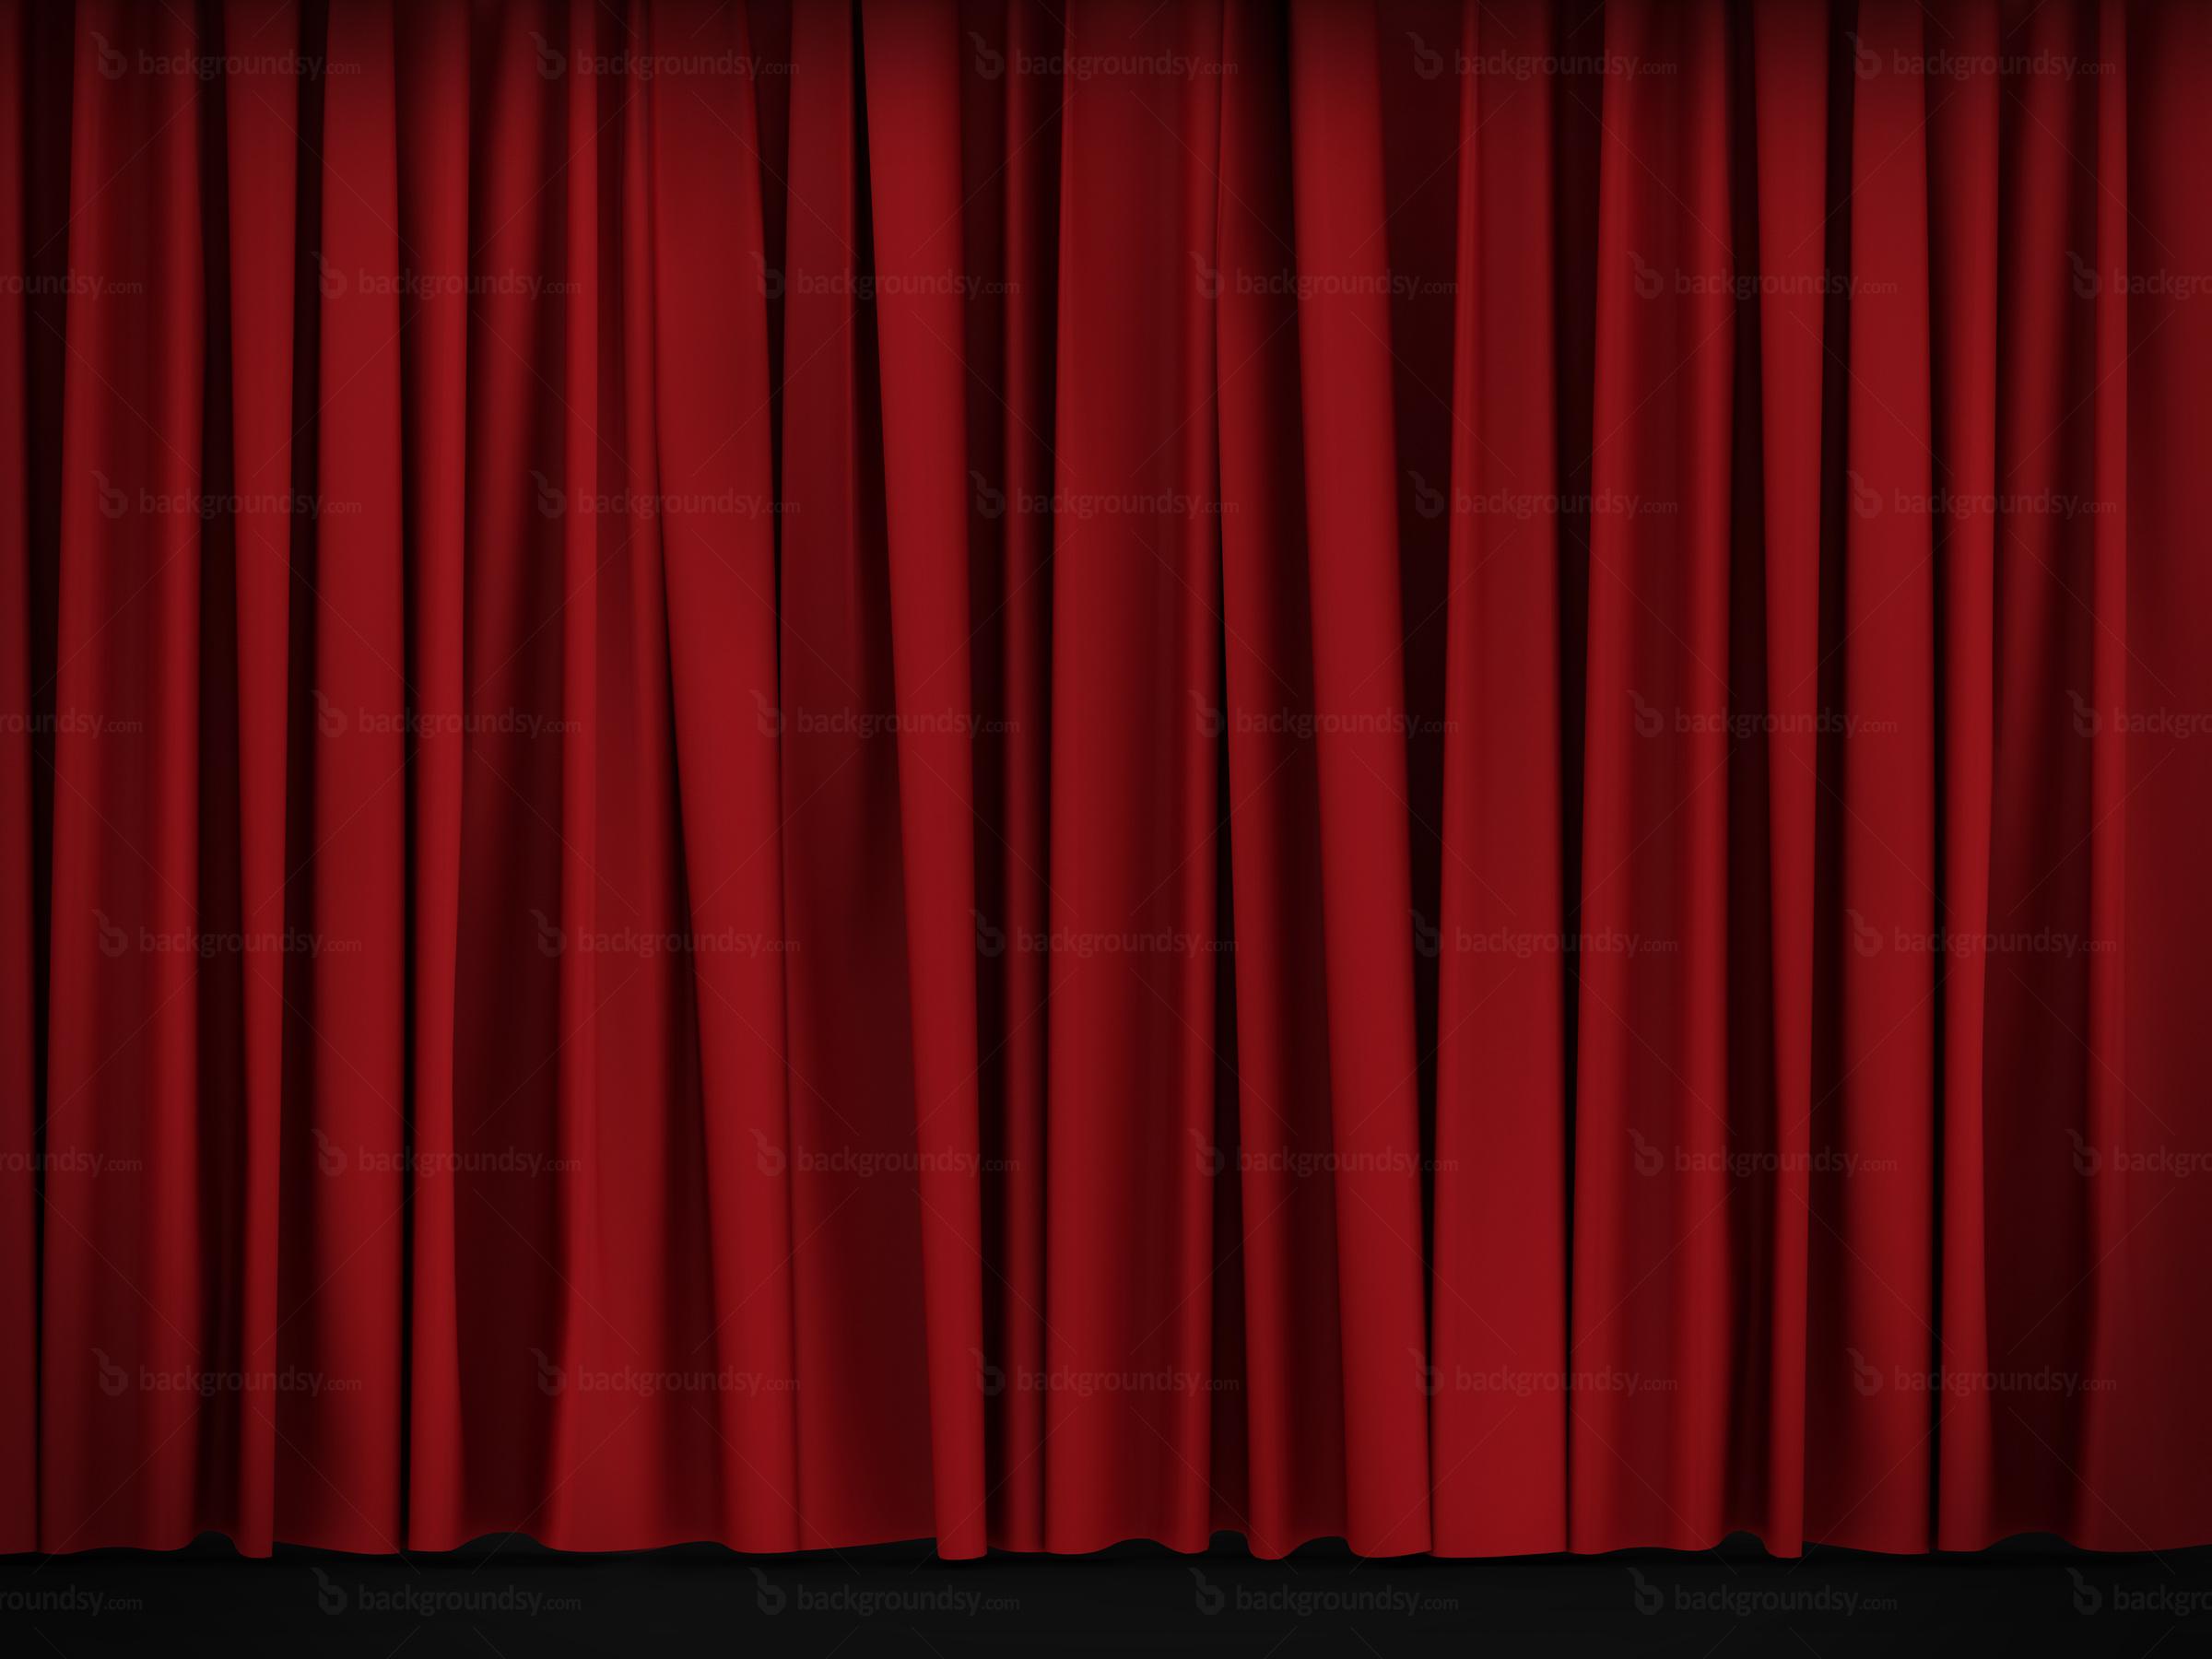 jpg 2400x1800 burgundy curtain background